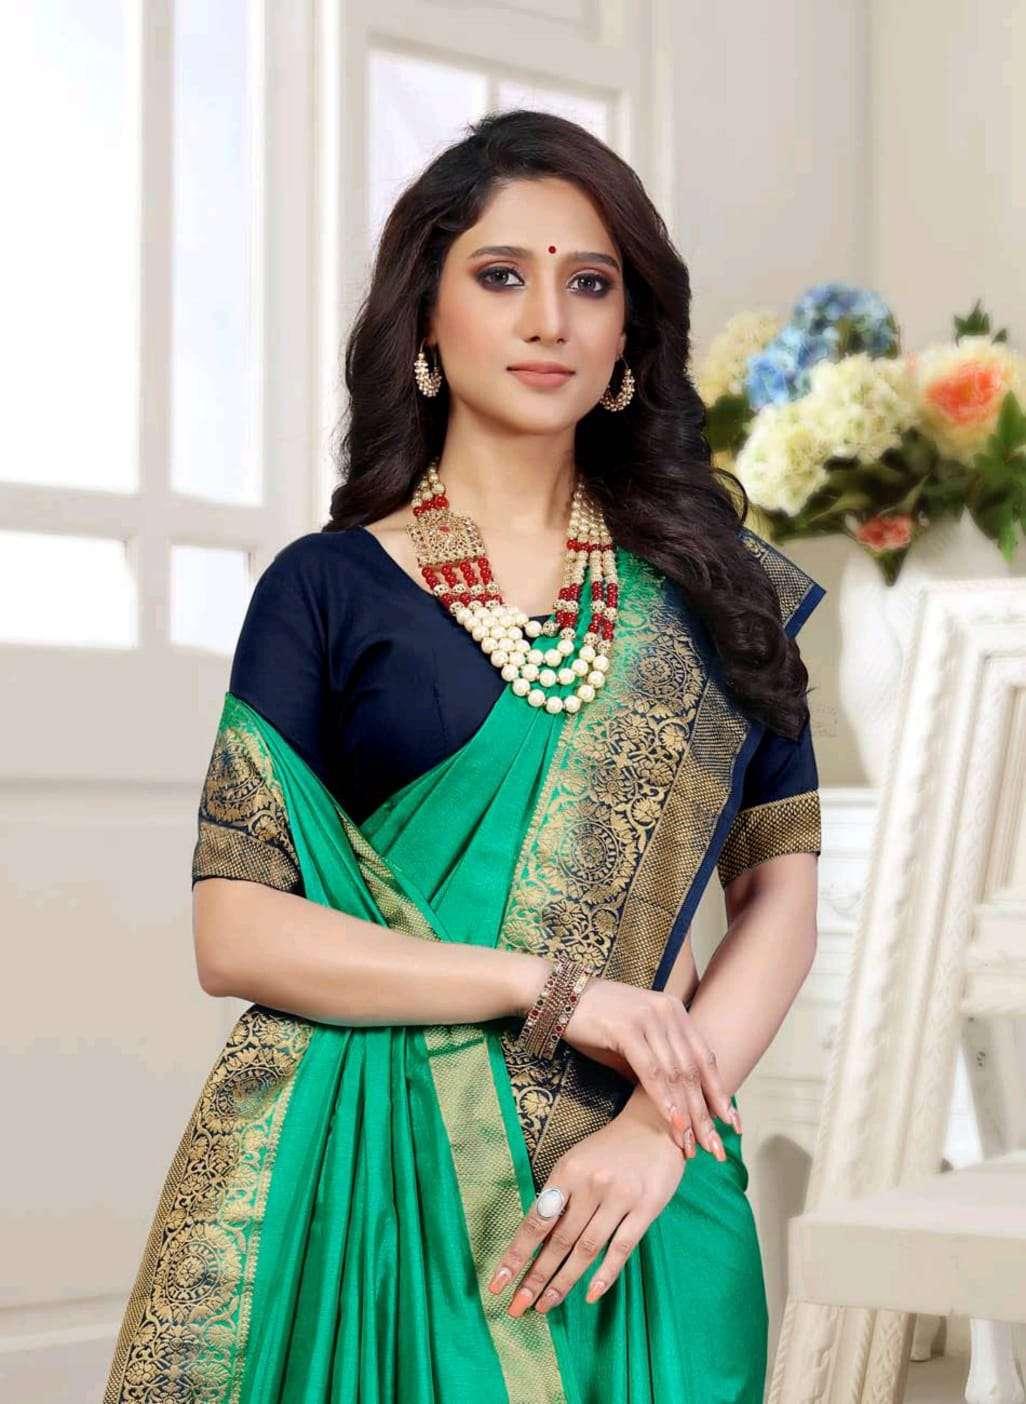 Ishika Saree Mala 2d Soft Silk With Zari Border Saree Exporter